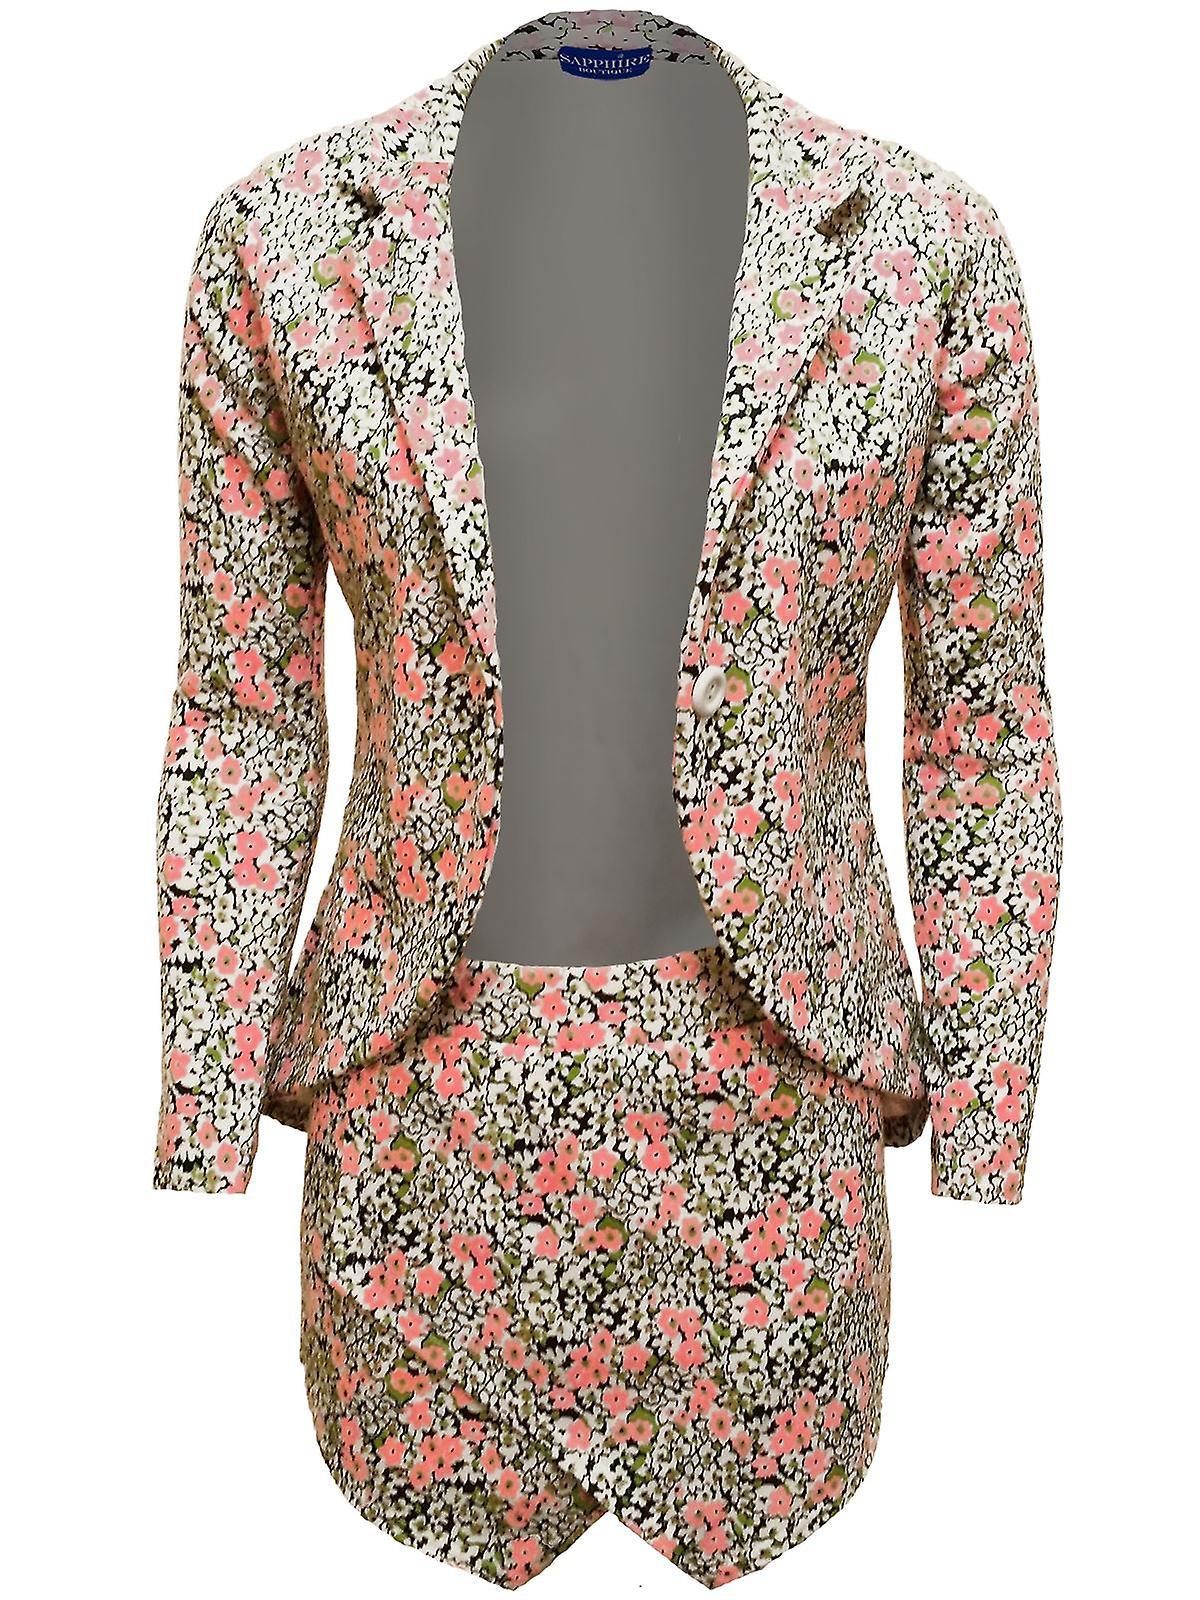 Ladies Sam Faiers Celeb Inspired Floral Print Ladies Two Piece Blazer Short Set